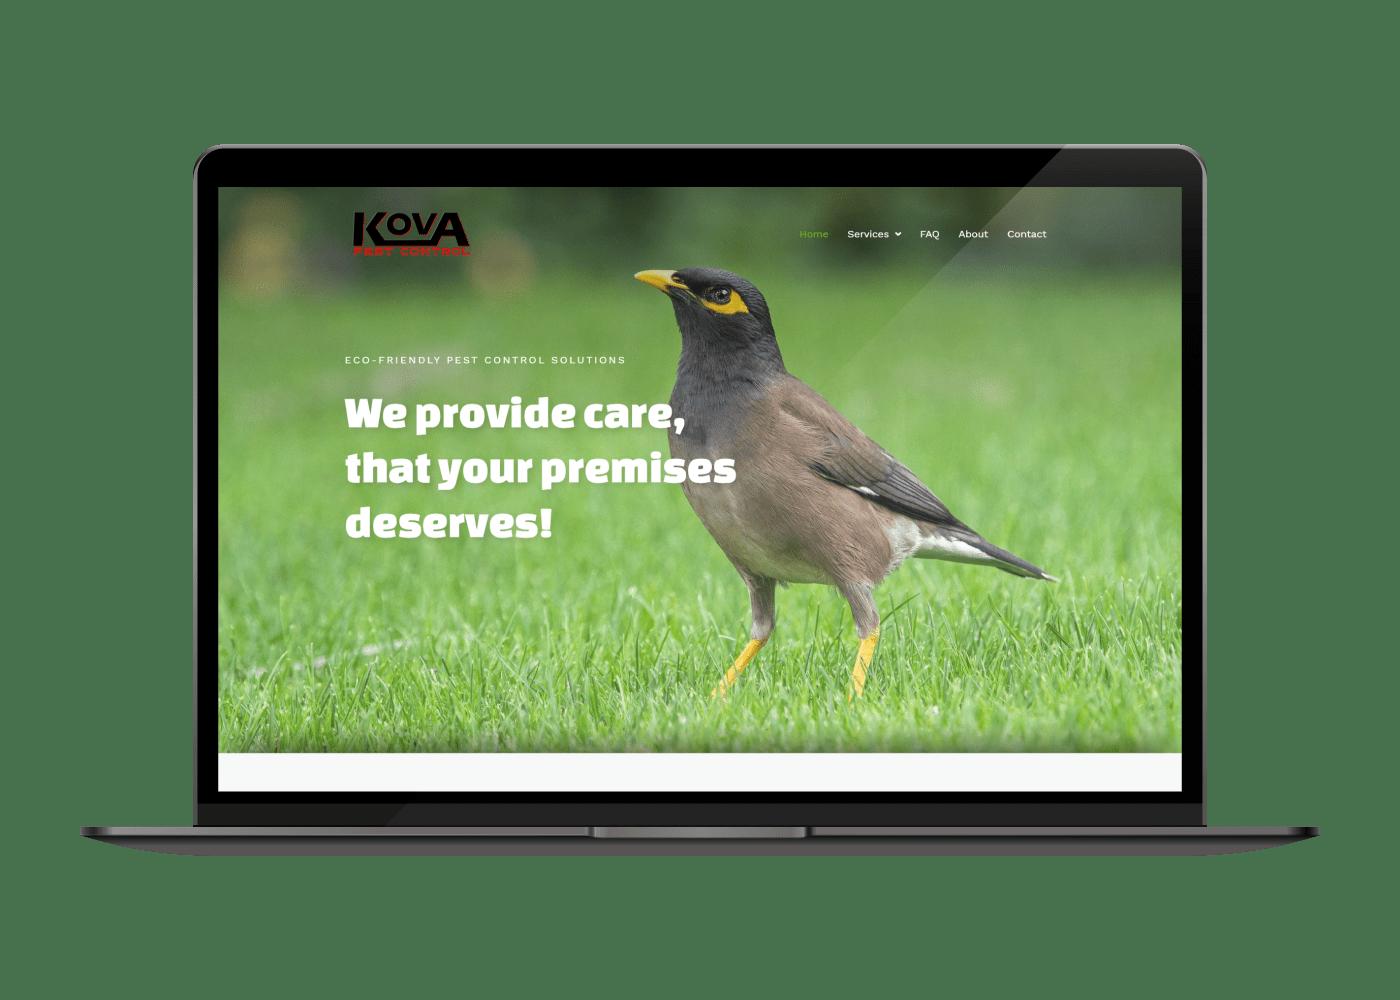 KOVA Pest Control desktop website